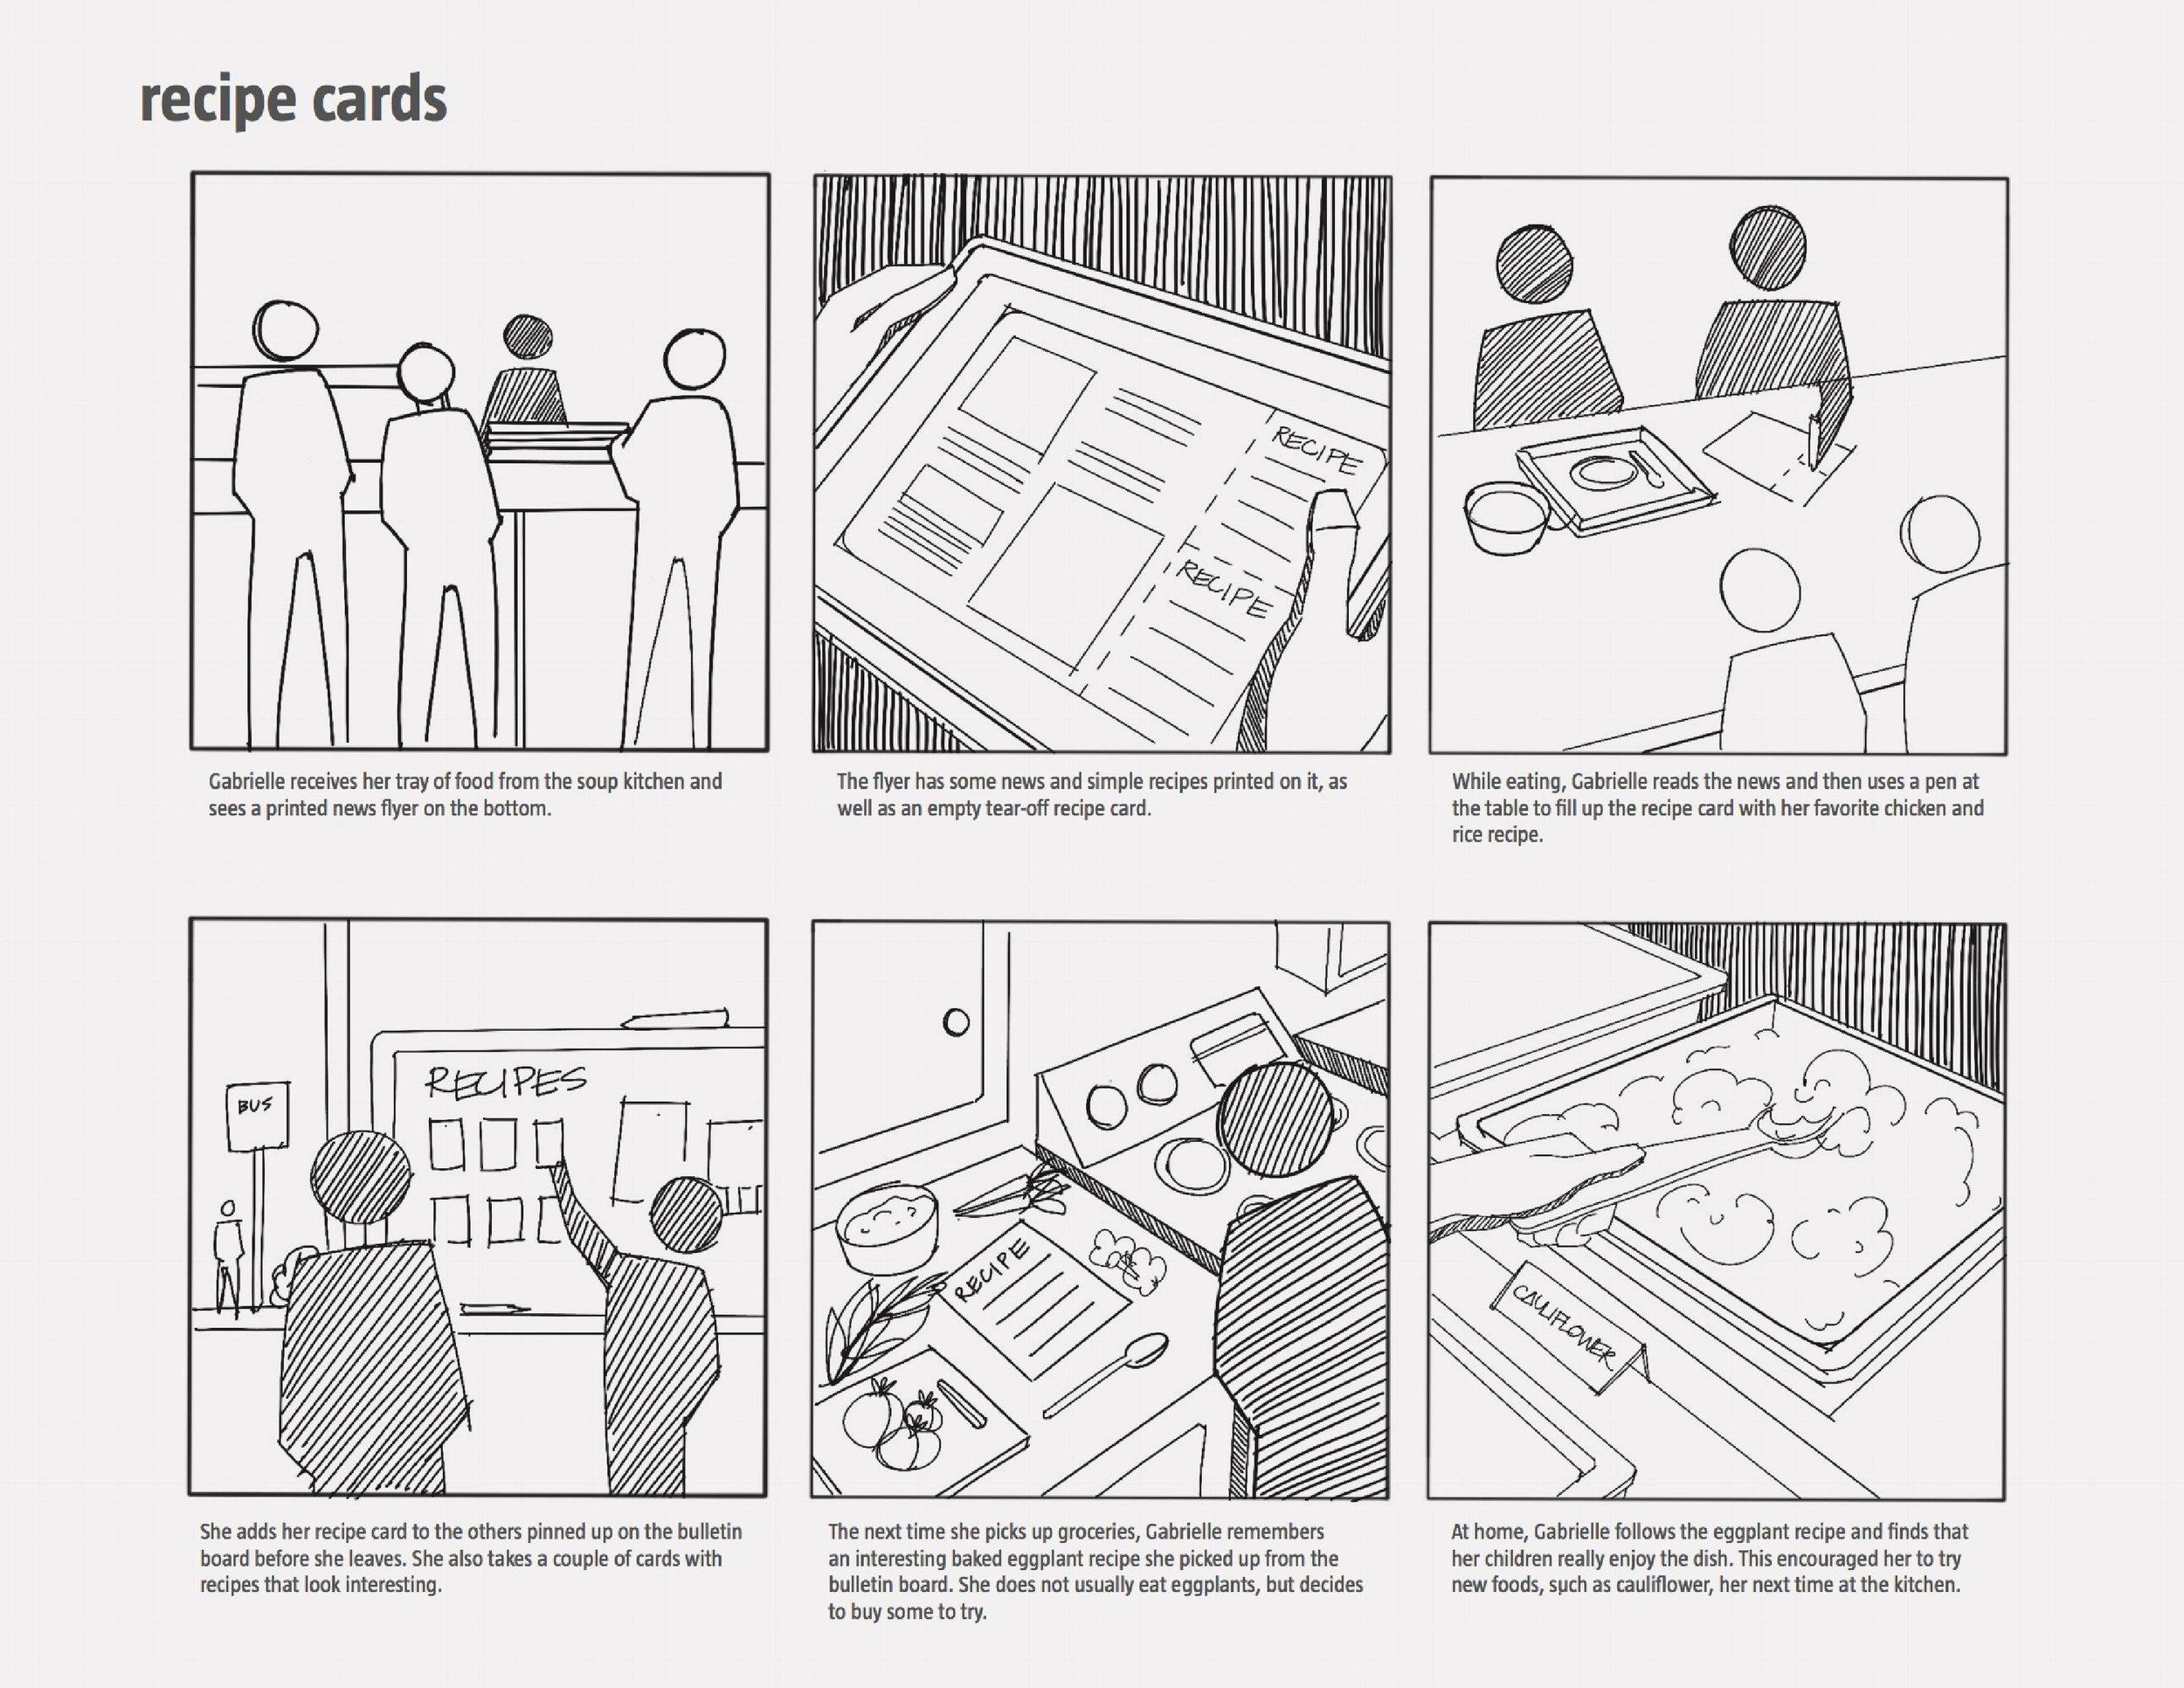 UCRE_FinalFoodReport_TeamMMM-page-036.jpg